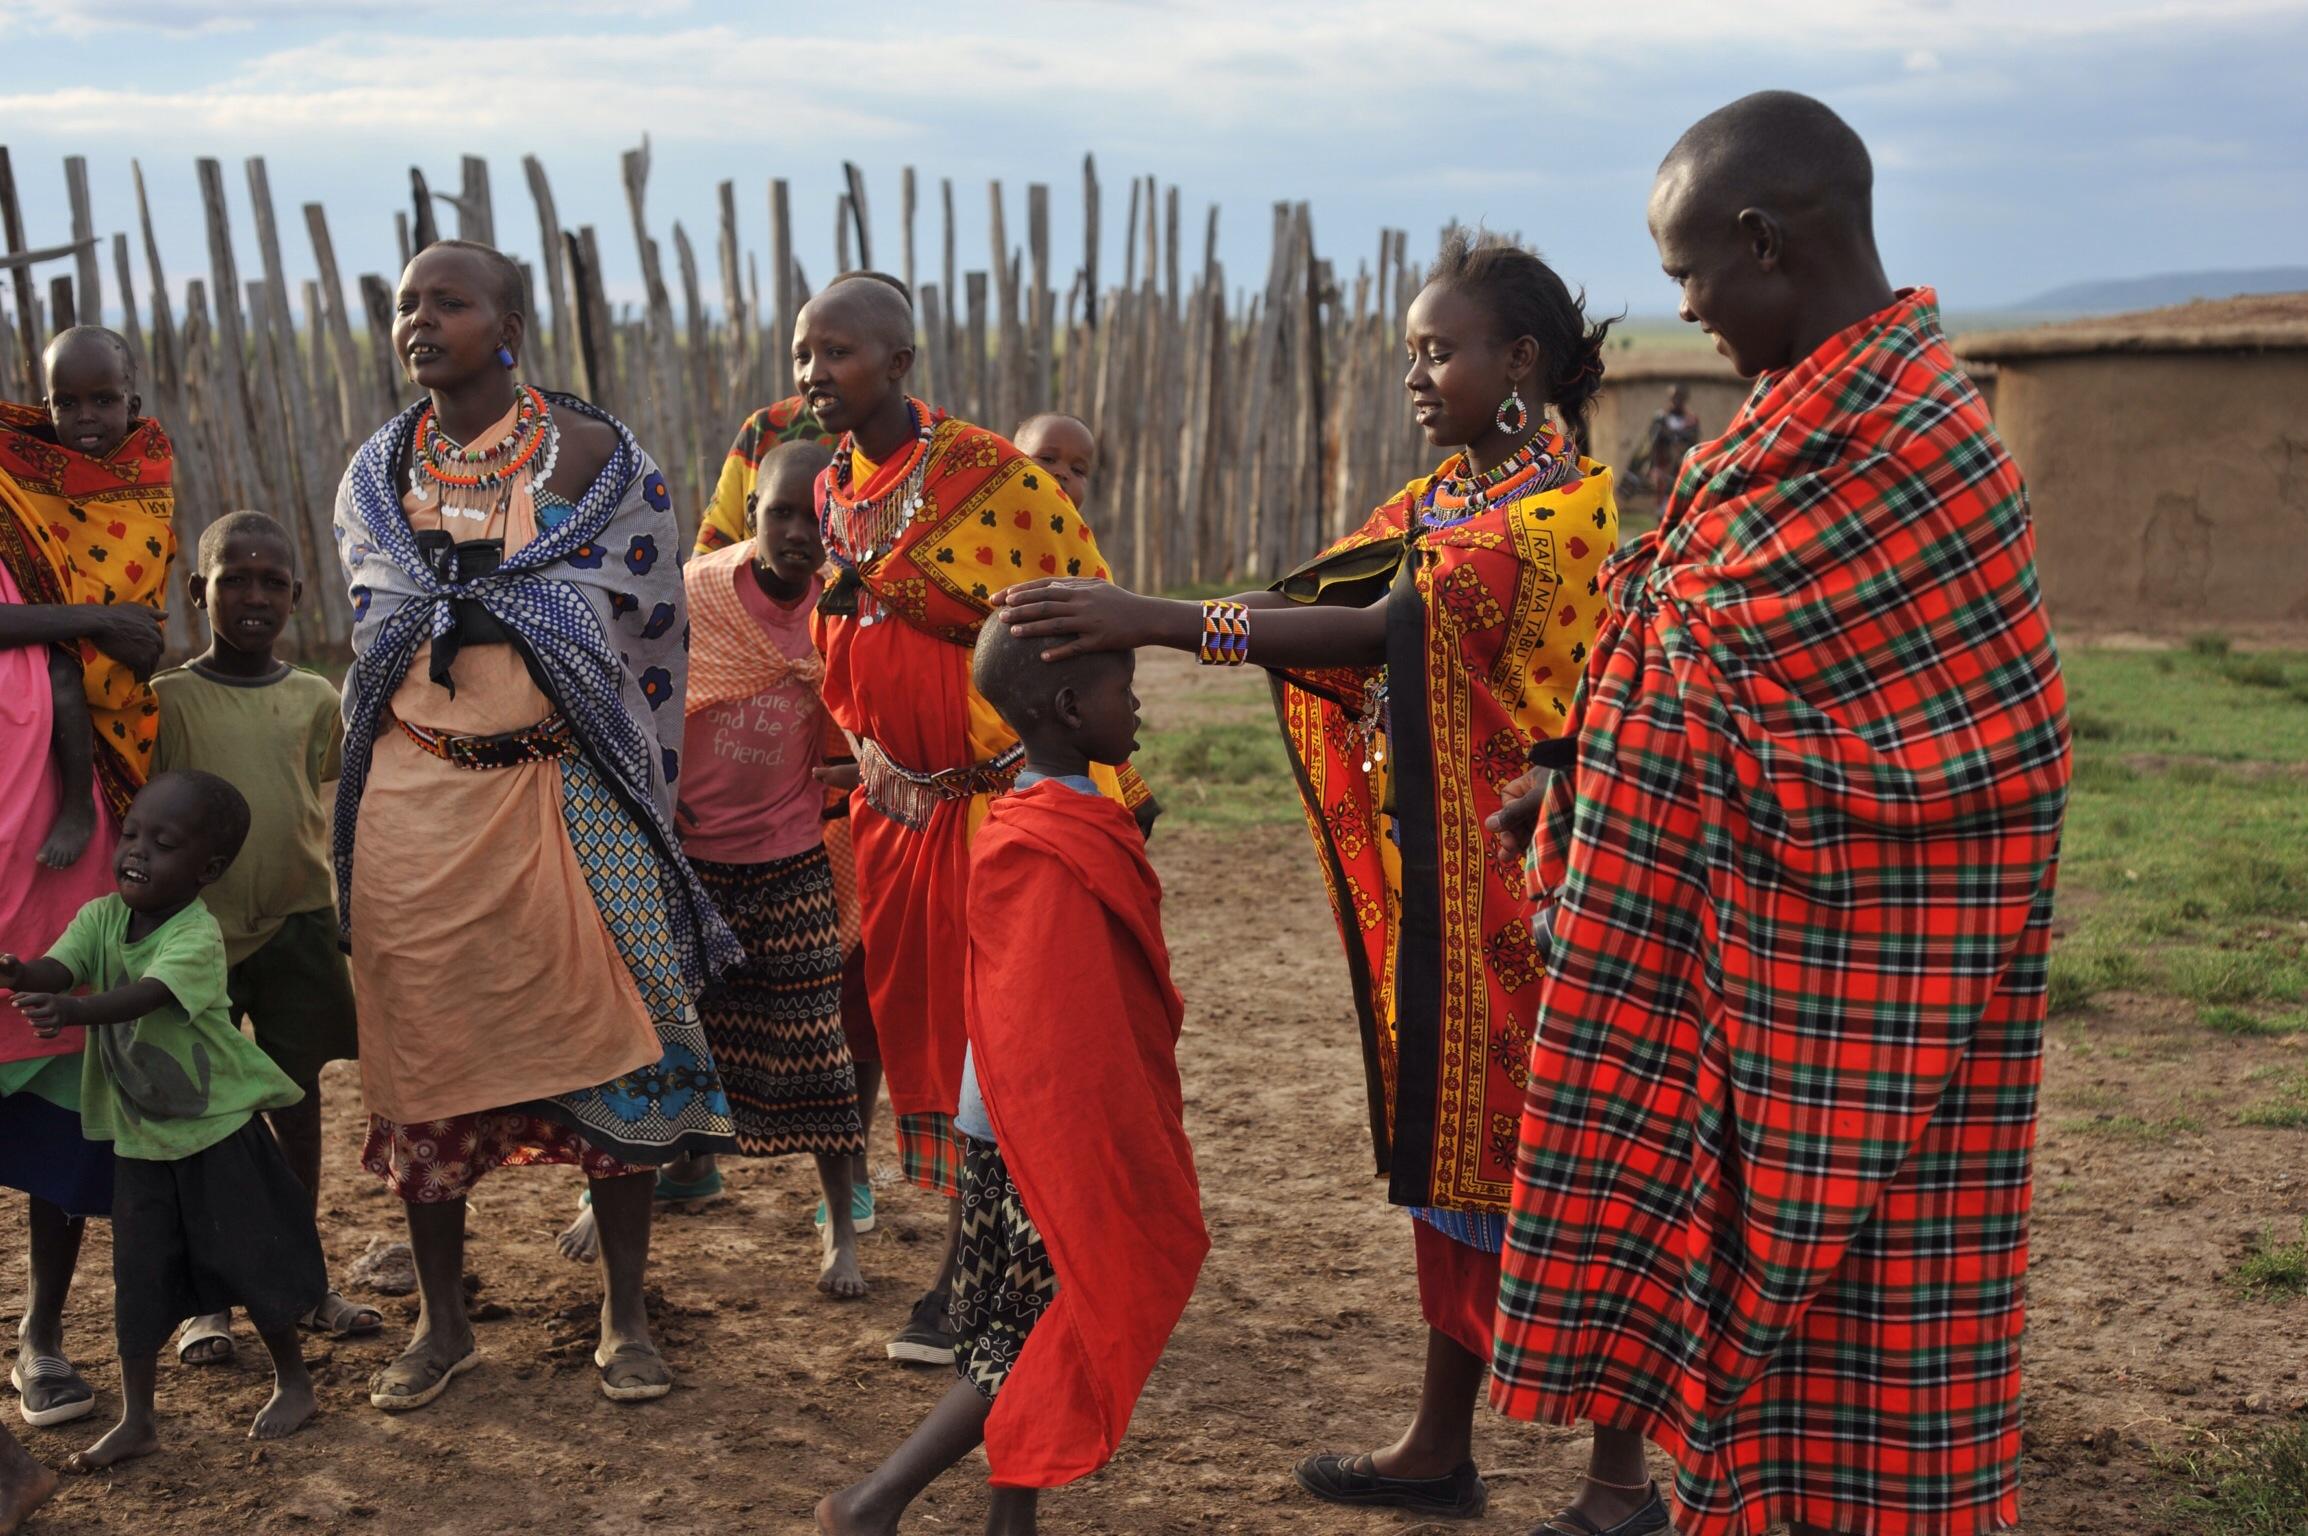 Encounter-Mara-cultural-visit-MR